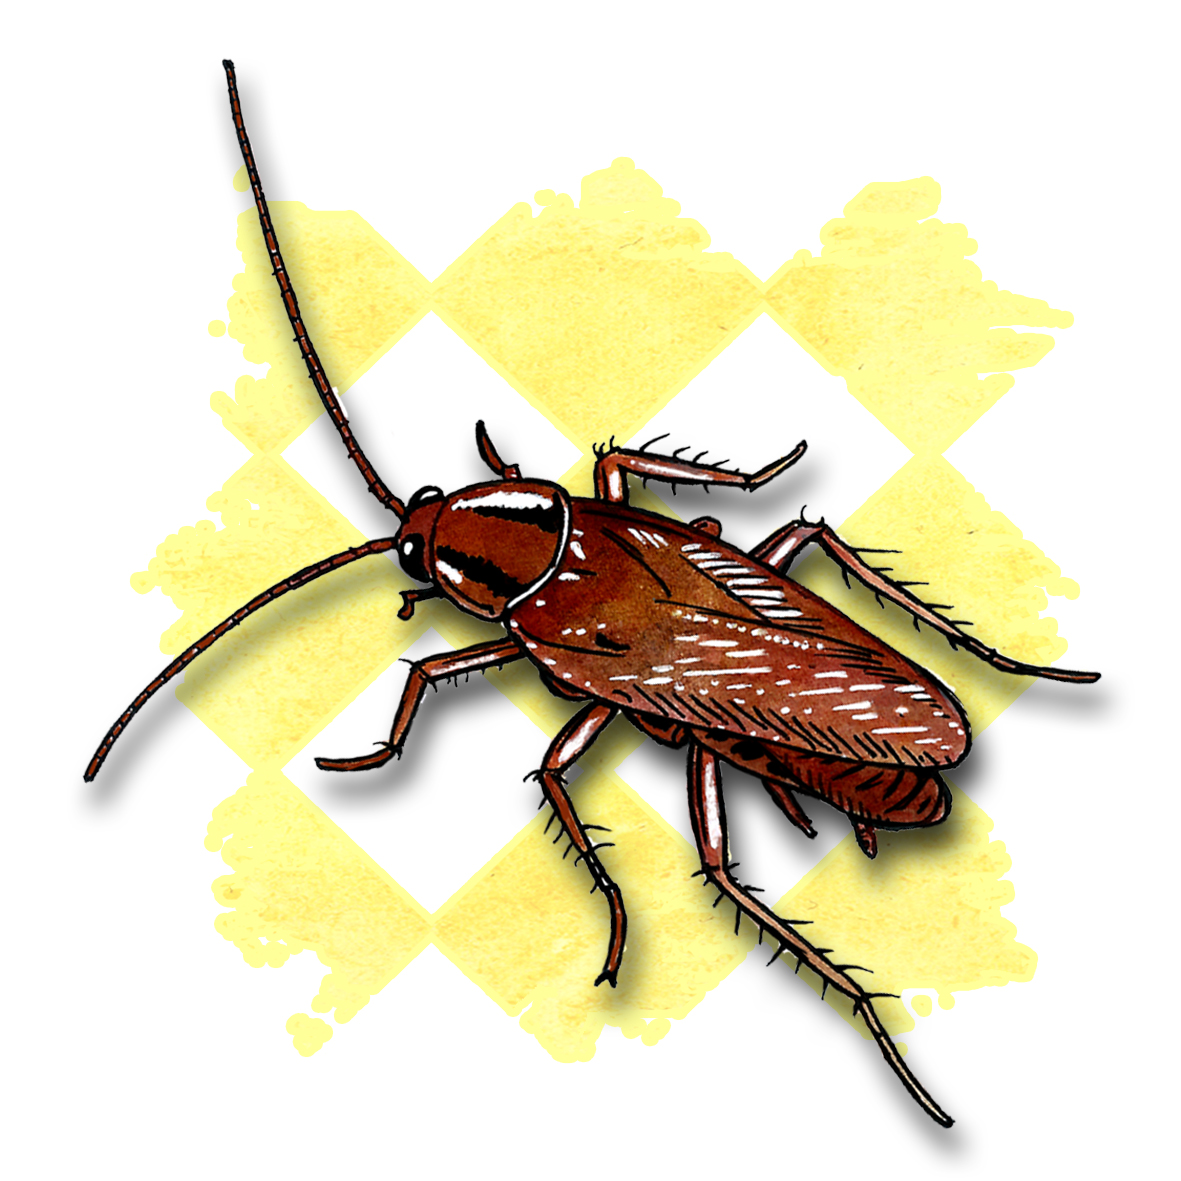 18. Cockroach